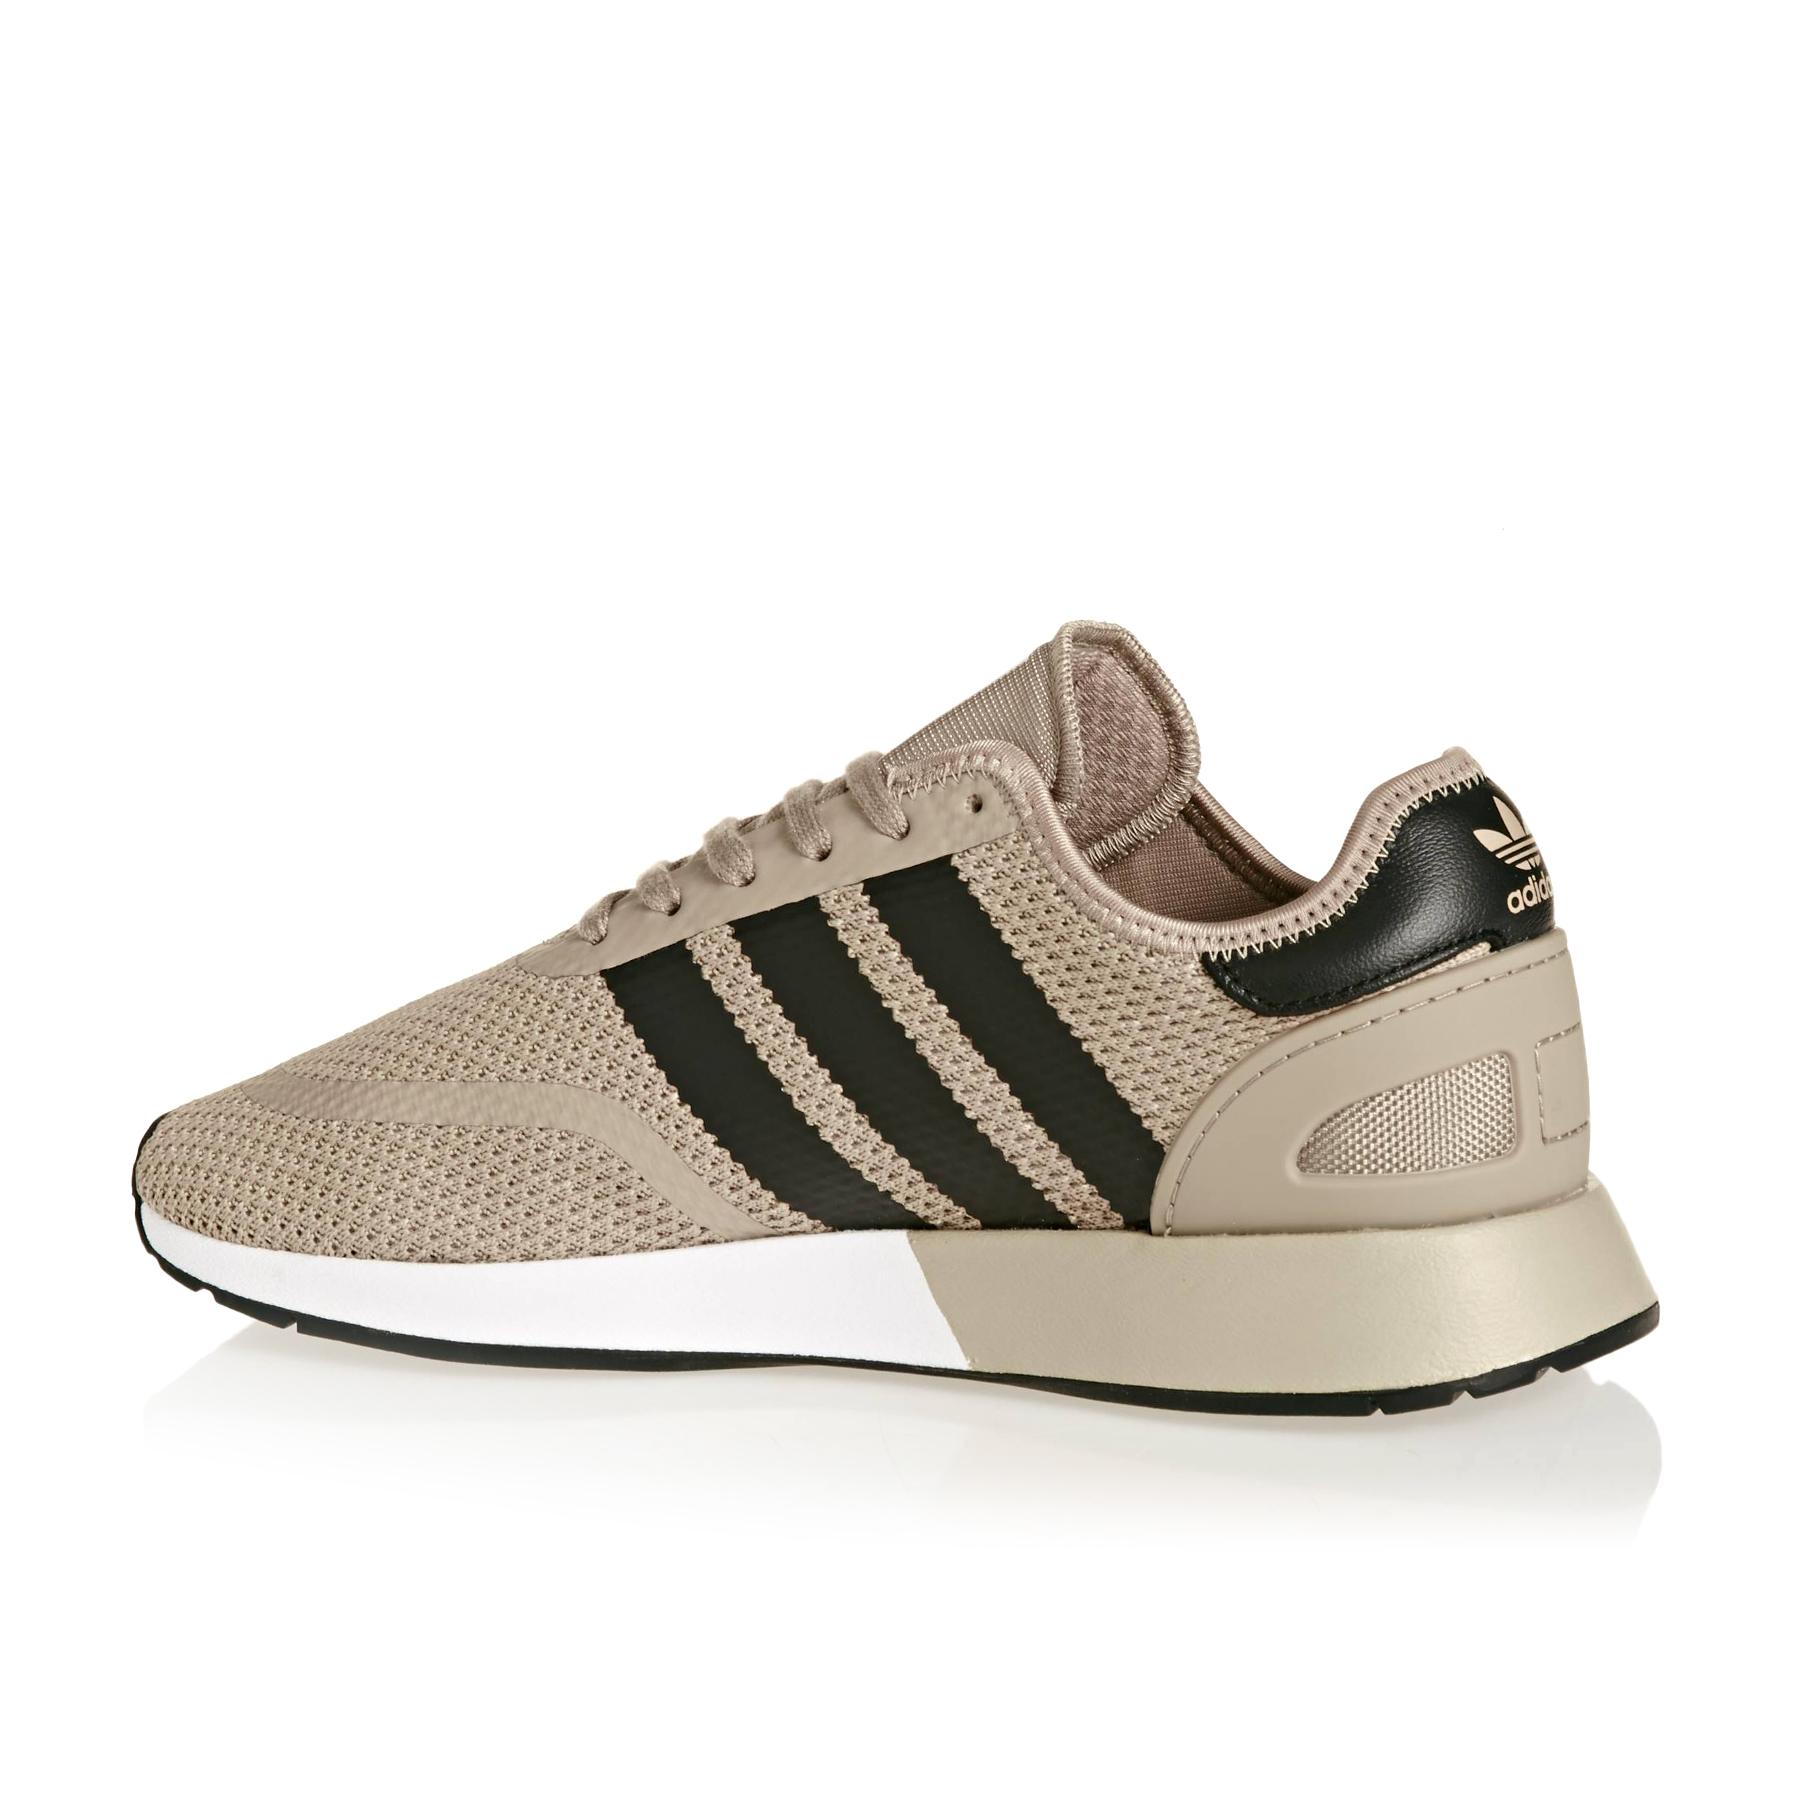 Adidas Originals N 5923 Shoes from Magicseaweed